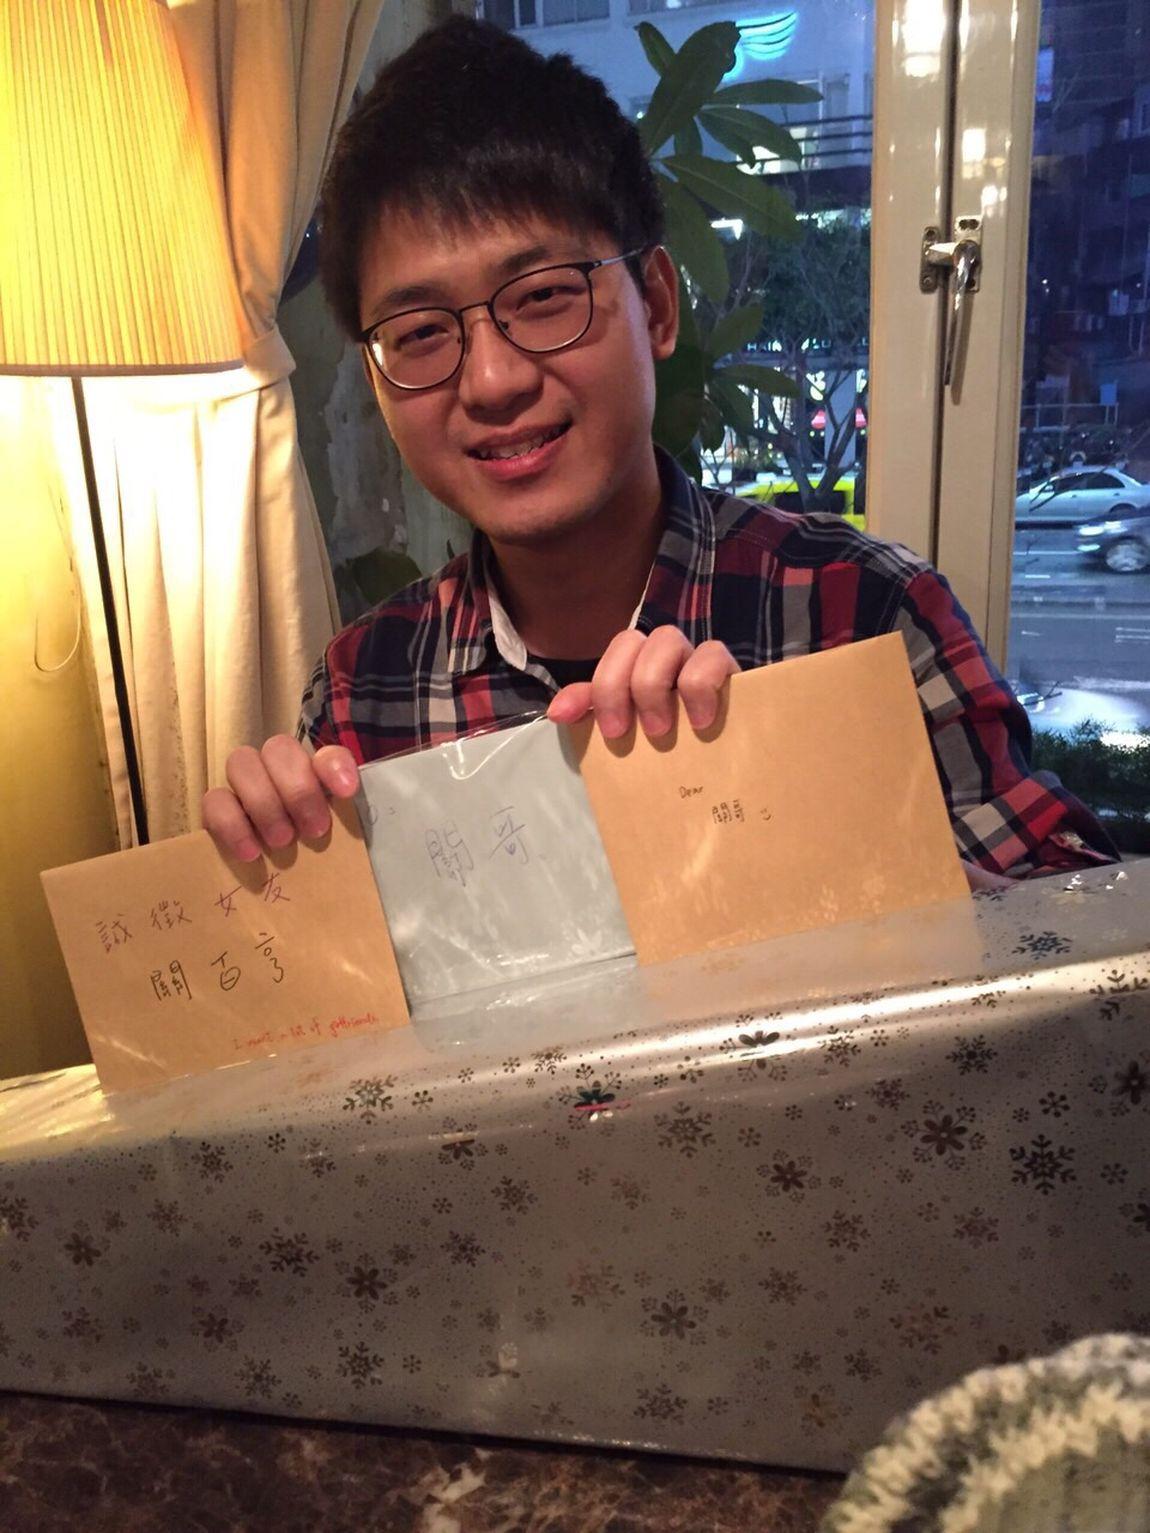 二月 Kaohsiung February Taiwan Taiwanese 臺灣 咖啡廳 Dinner 晚餐 聚會 高雄 生日快樂 Happy Birthday!